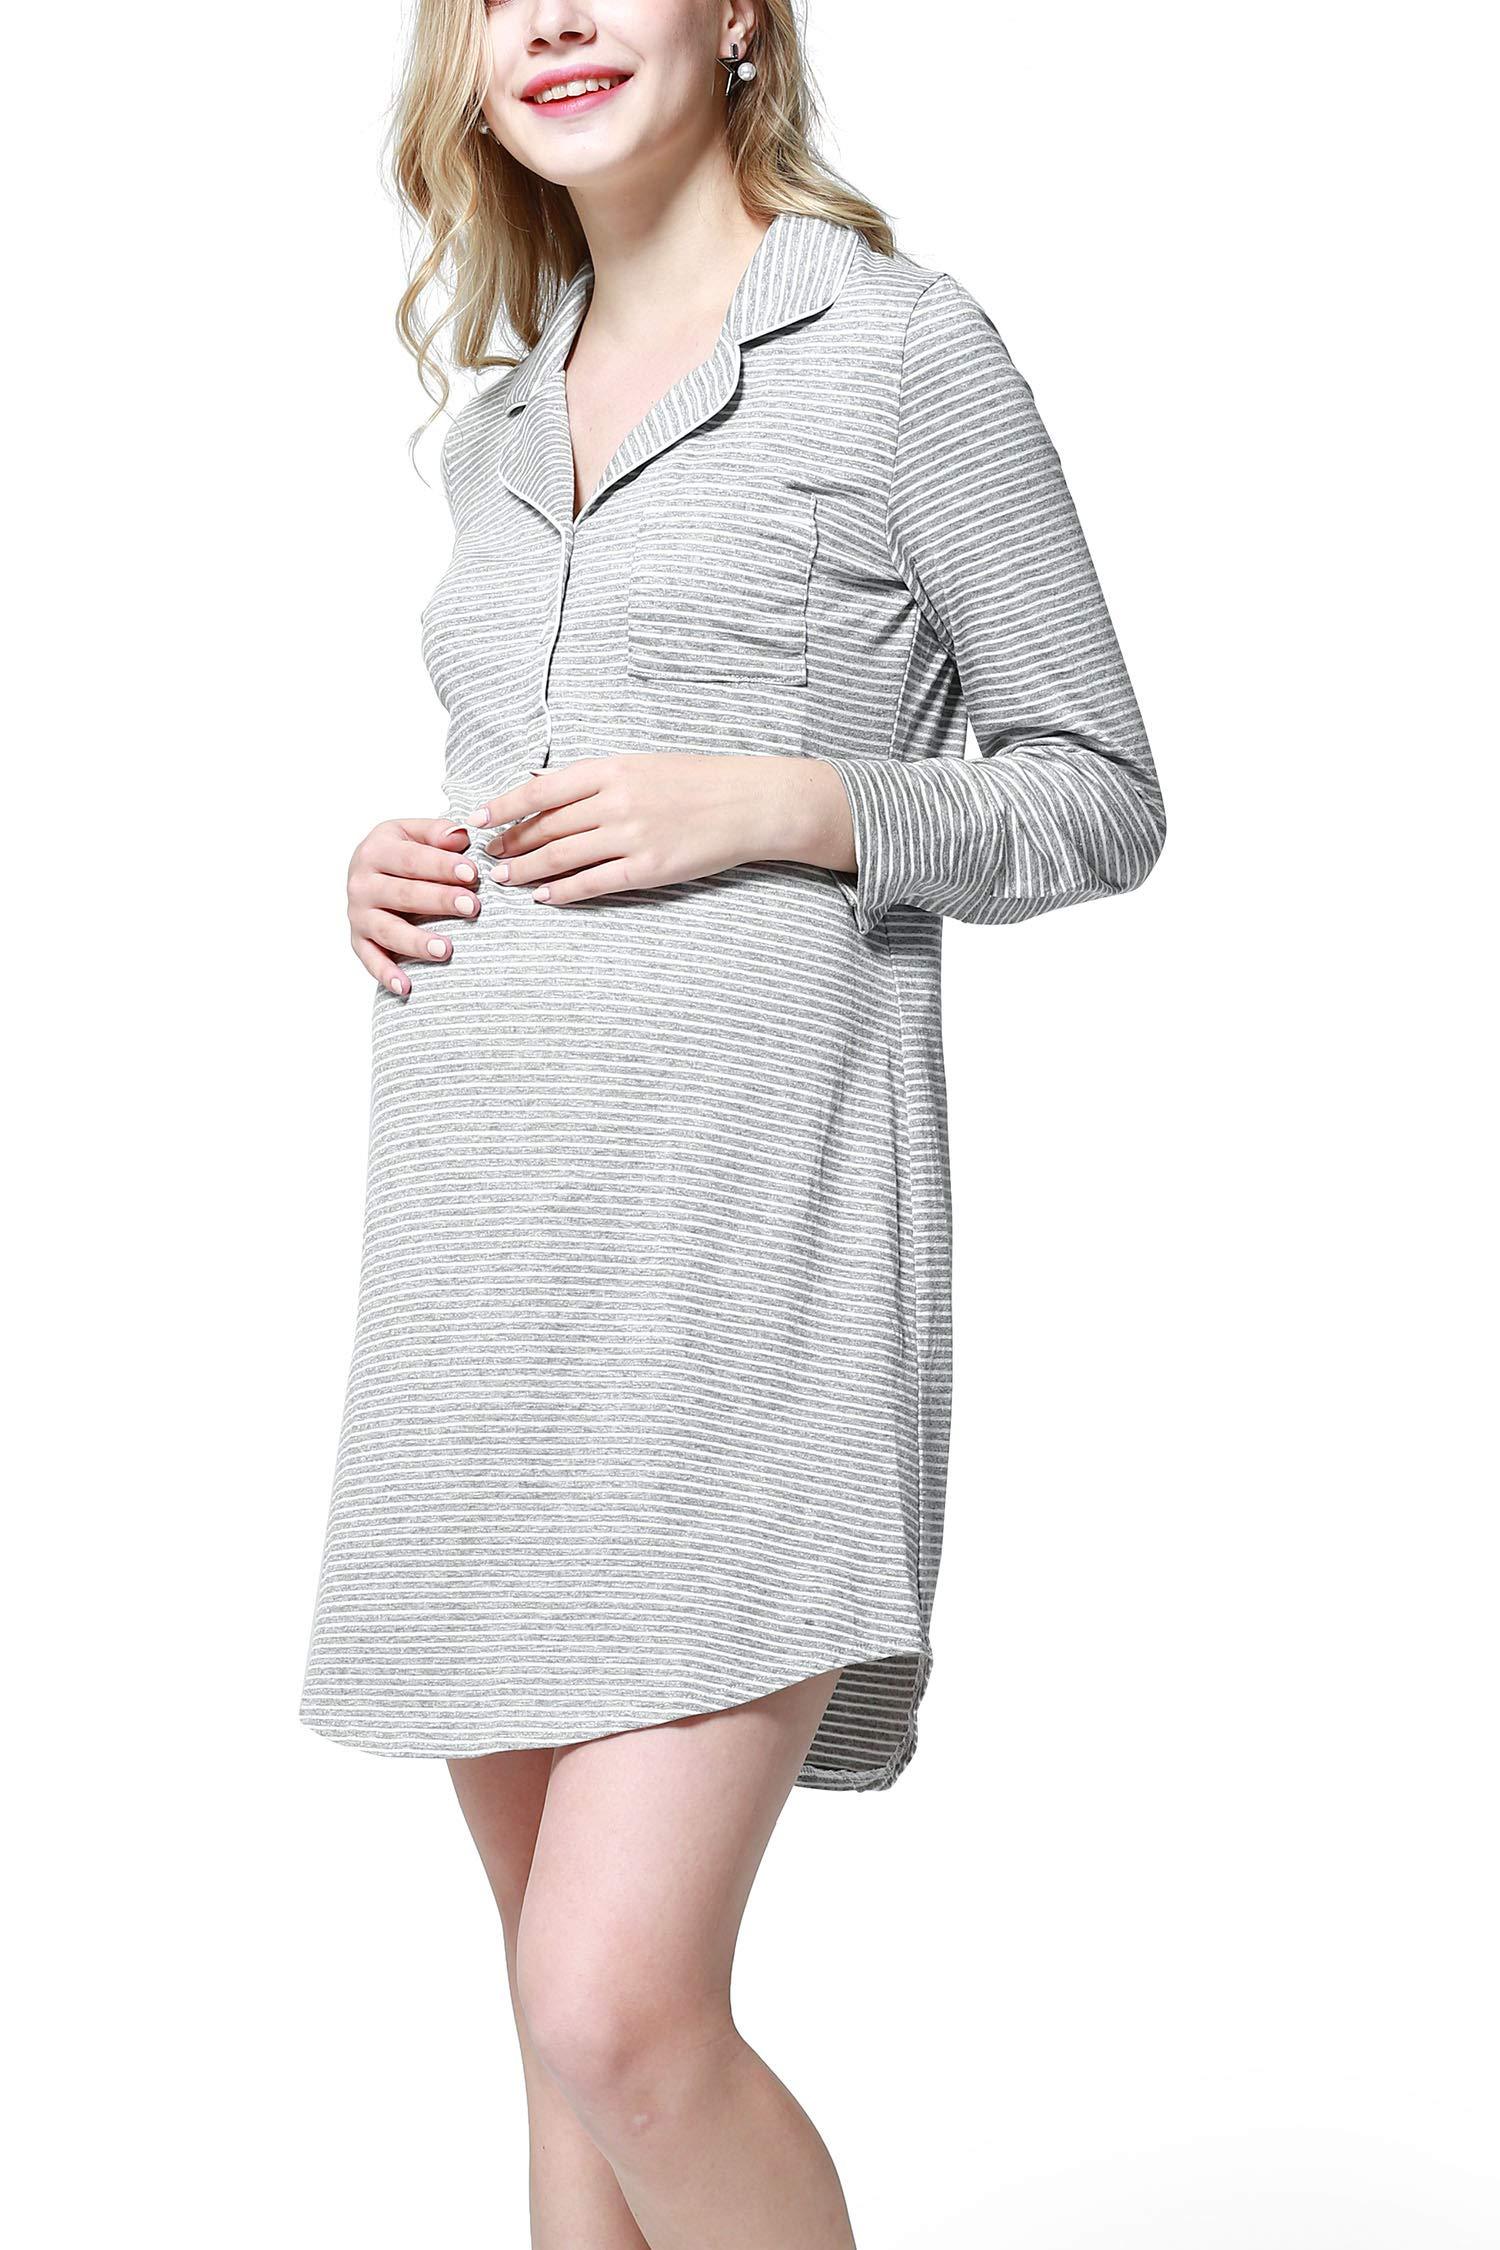 Dance Fairy Molliya Women's Maternity Dress Stripes Nursing Nightgown Breastfeeding,Lapel Collar Pajamas (Gray, M) by Dance Fairy (Image #7)